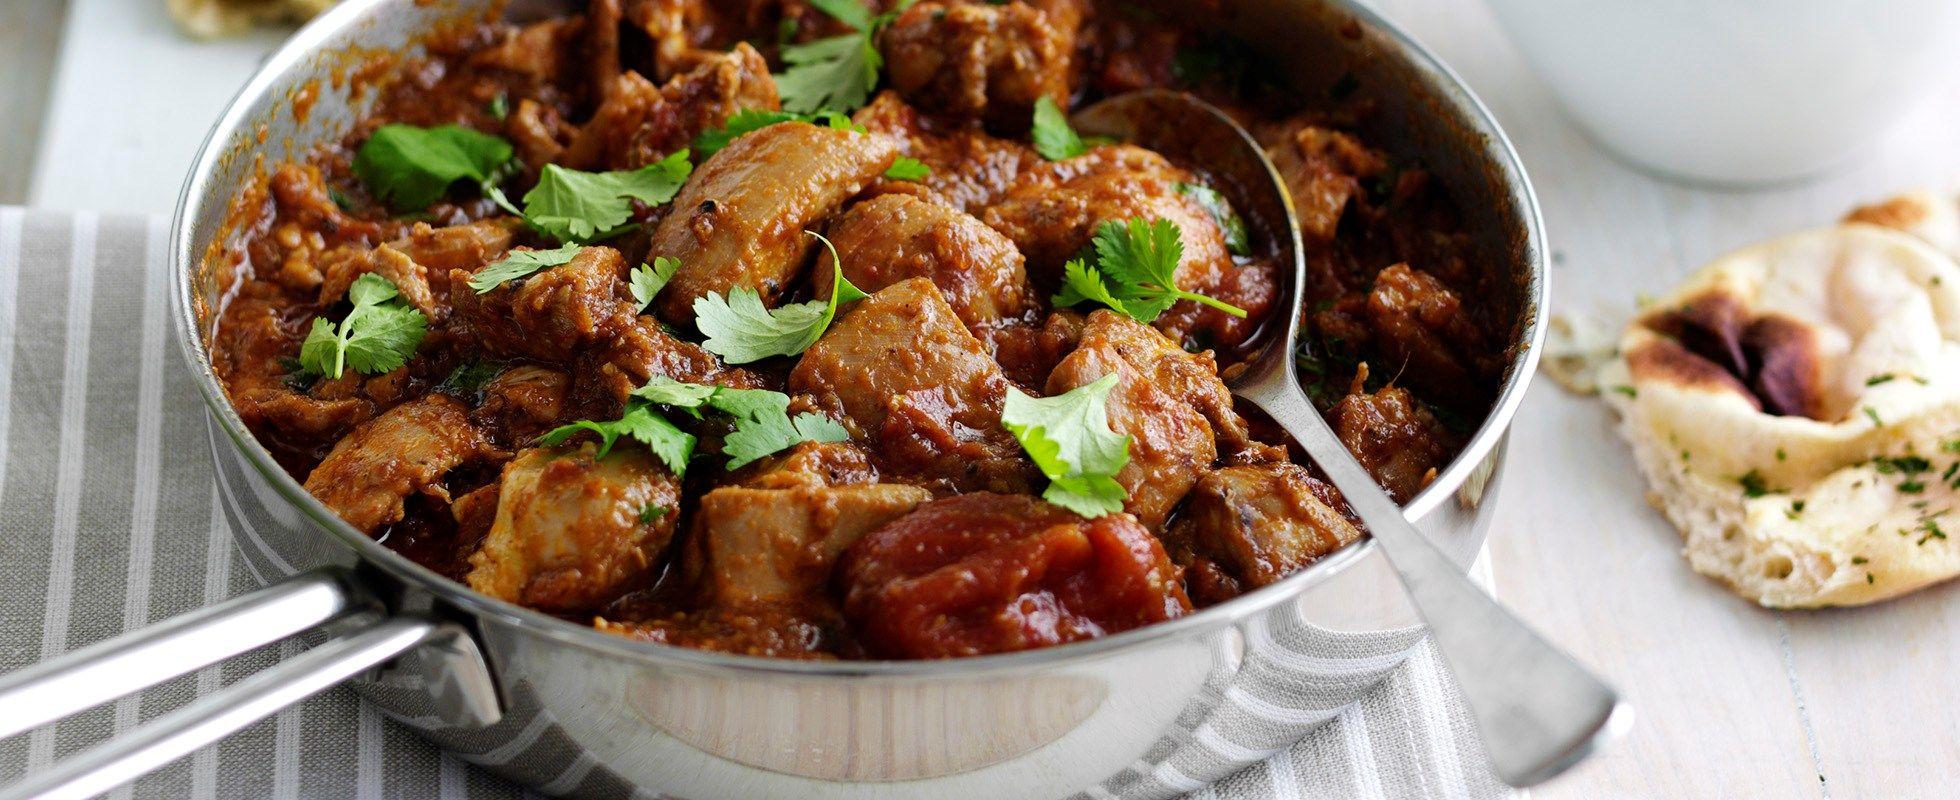 Chicken madras 300 calories chicken curry and curry chicken madras forumfinder Images